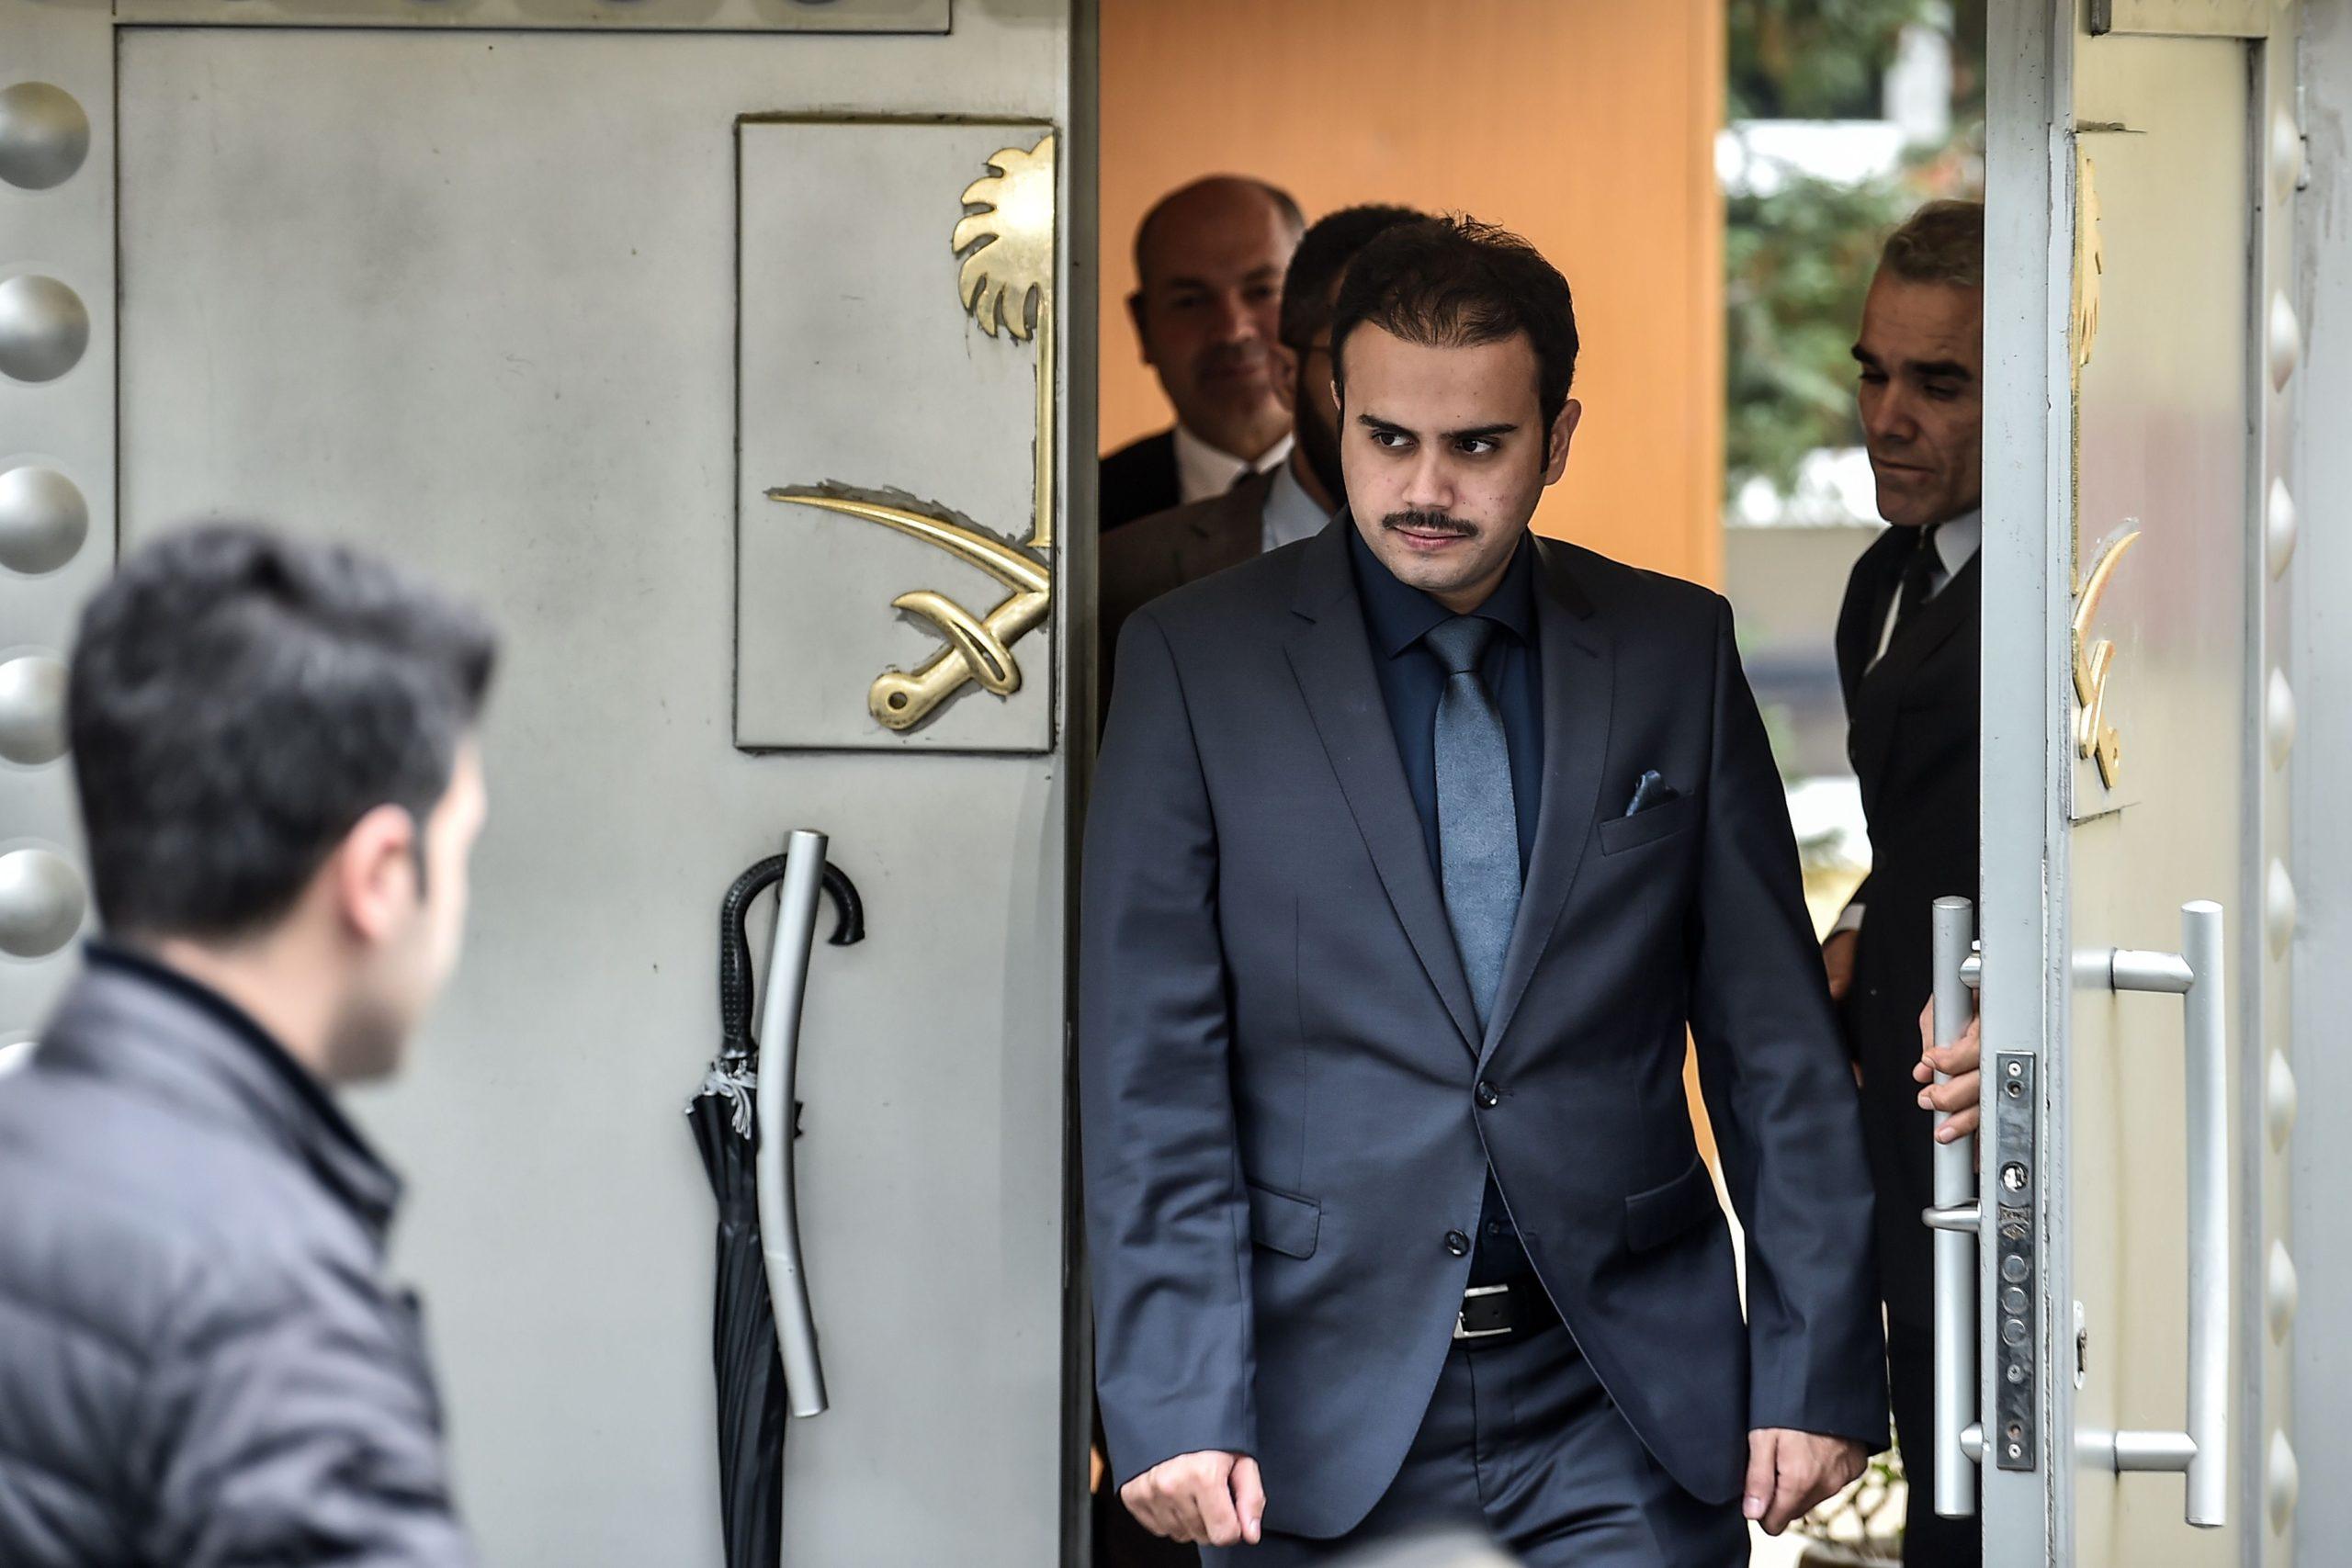 Image for Rahvusvahelise skandaali keskmes- Jamal Khashoggi kadumine